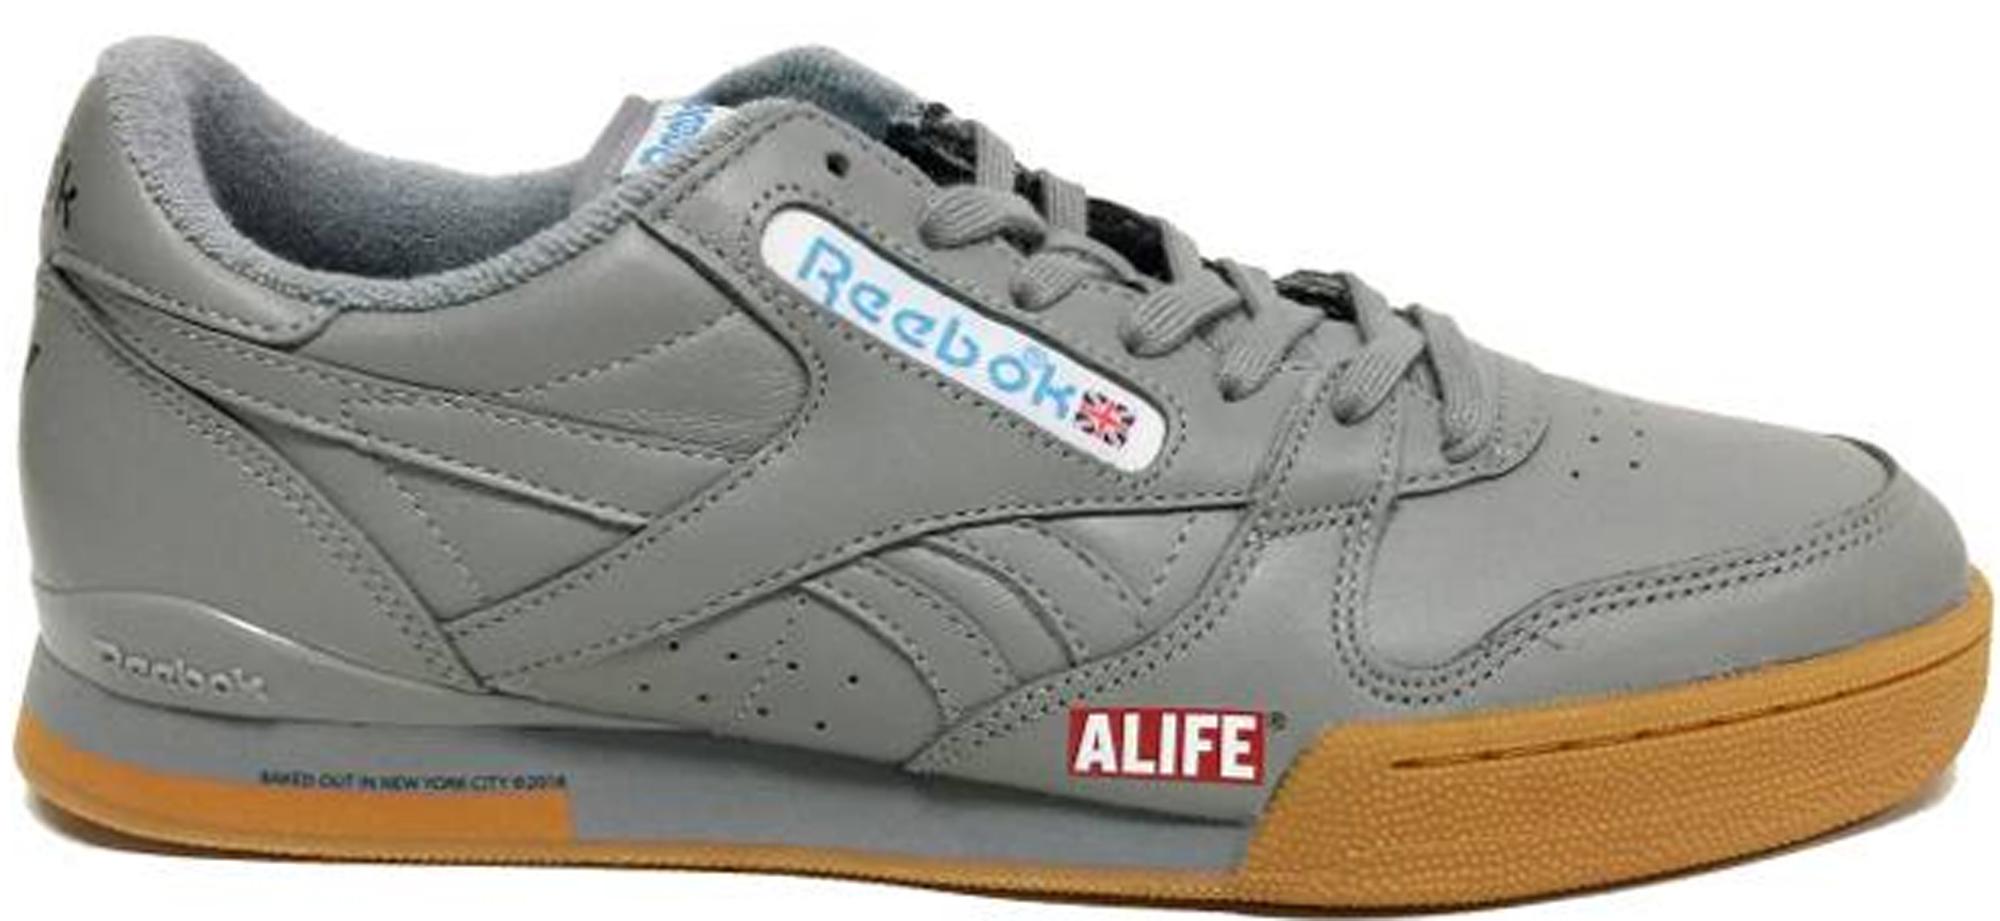 Reebok Phase 1 Pro Alife Grey - BS7122